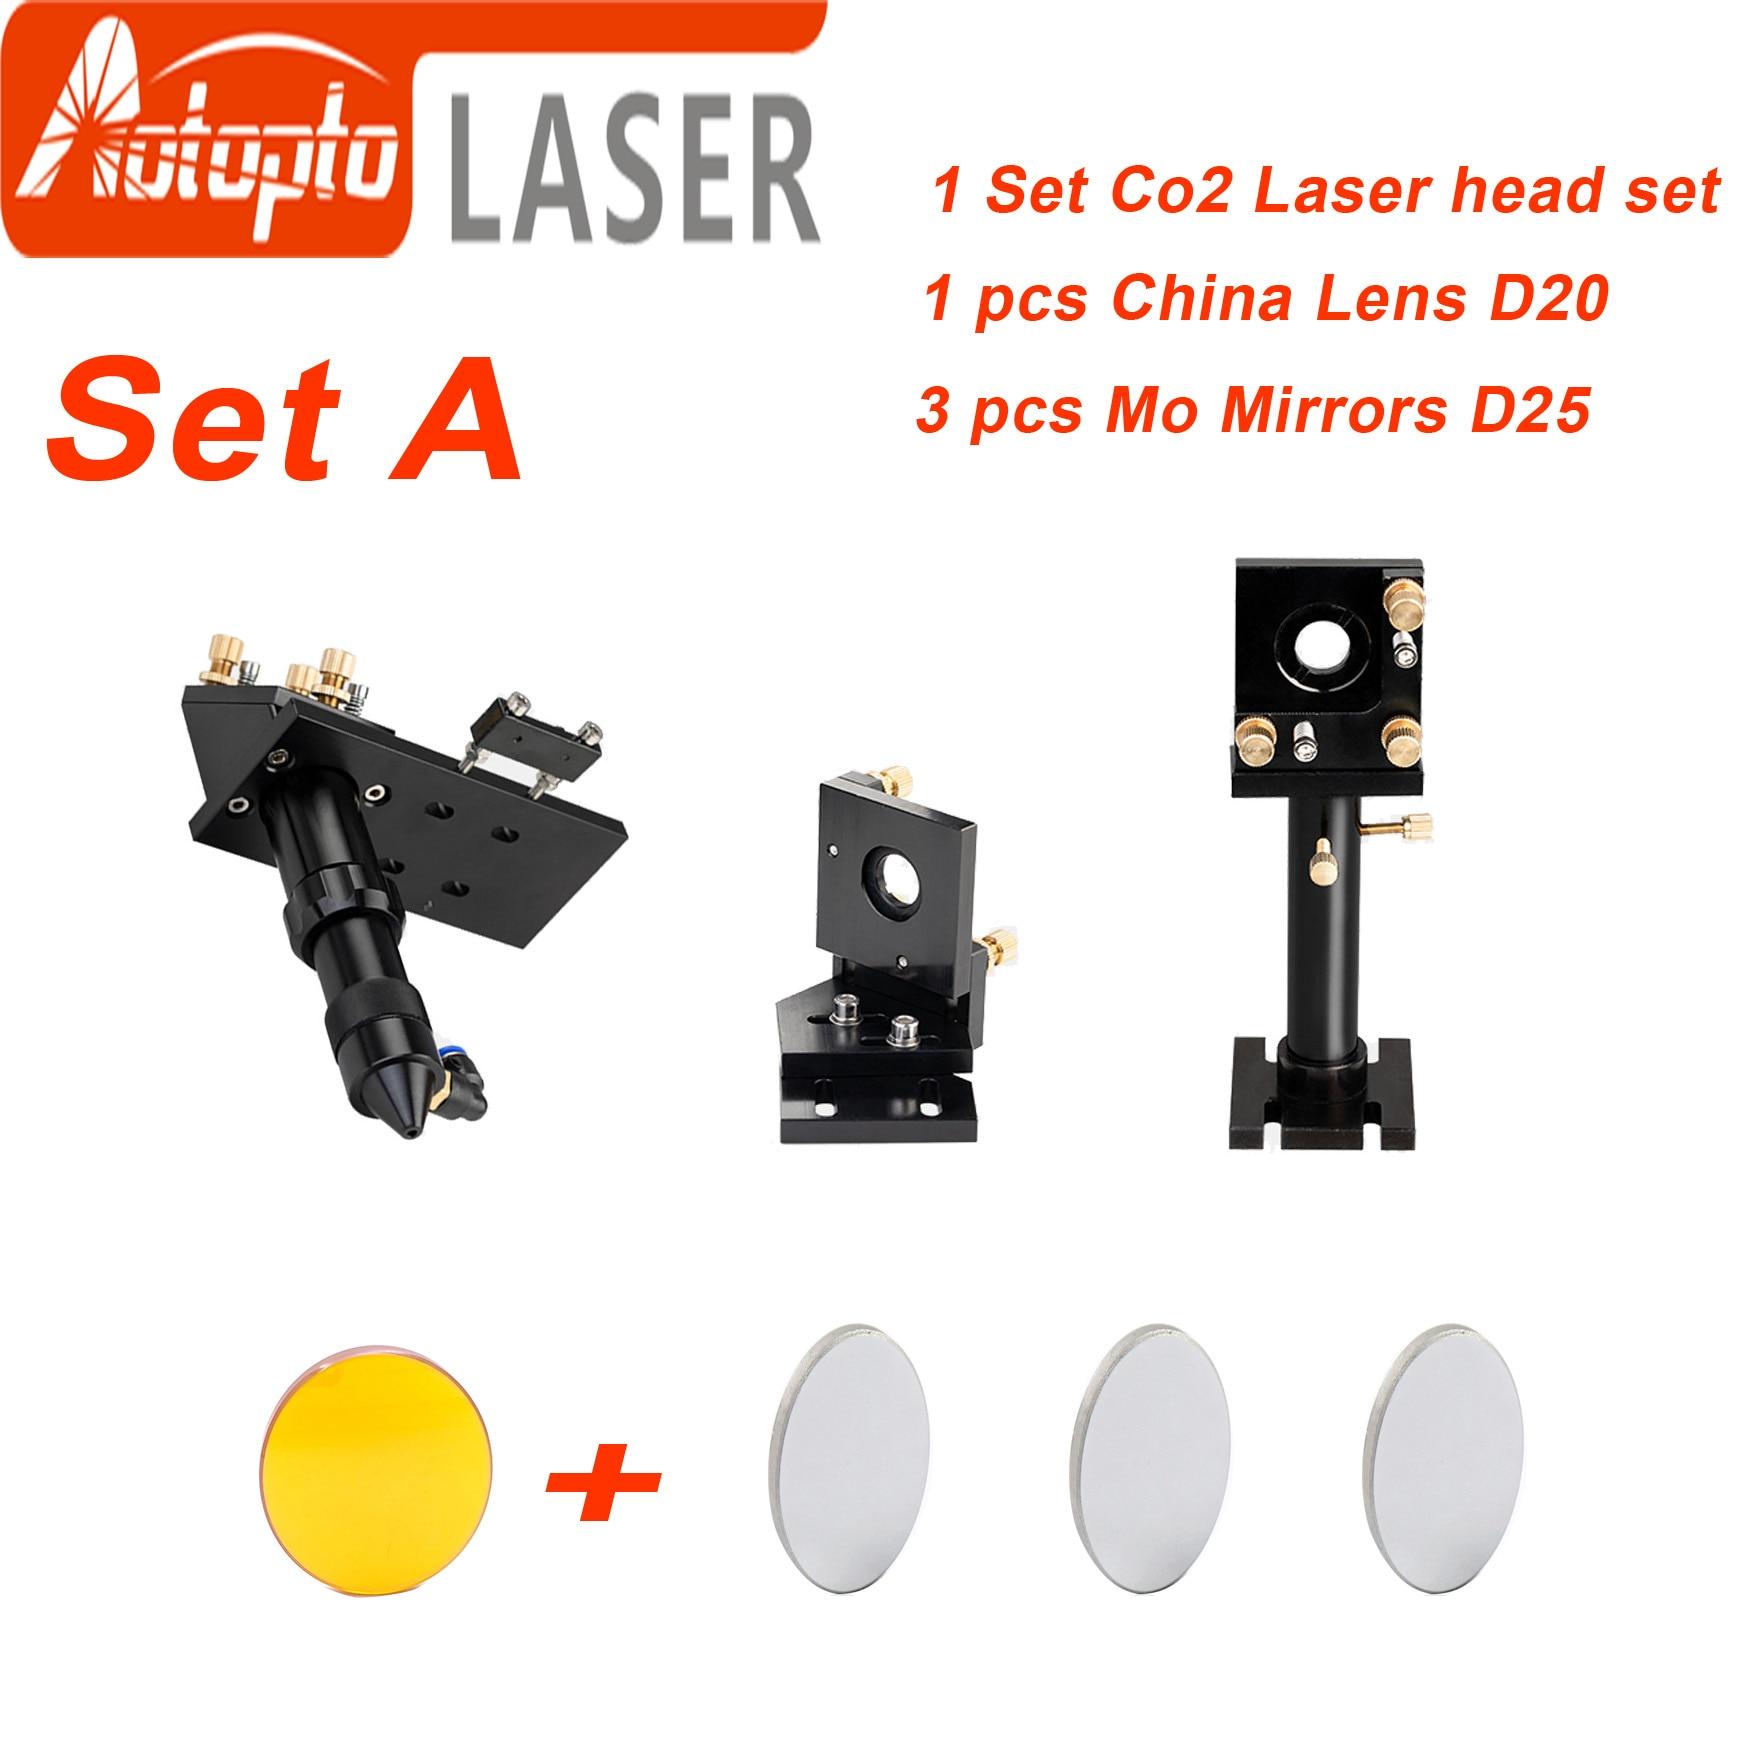 CO2 Laser Head Set Kit + 1 Pcs Dia.20mm ZnSe Focus Lens + 3 Pcs Dia.25m Mo/Si Mirror 25mm For Laser Engraving Cutting Machine